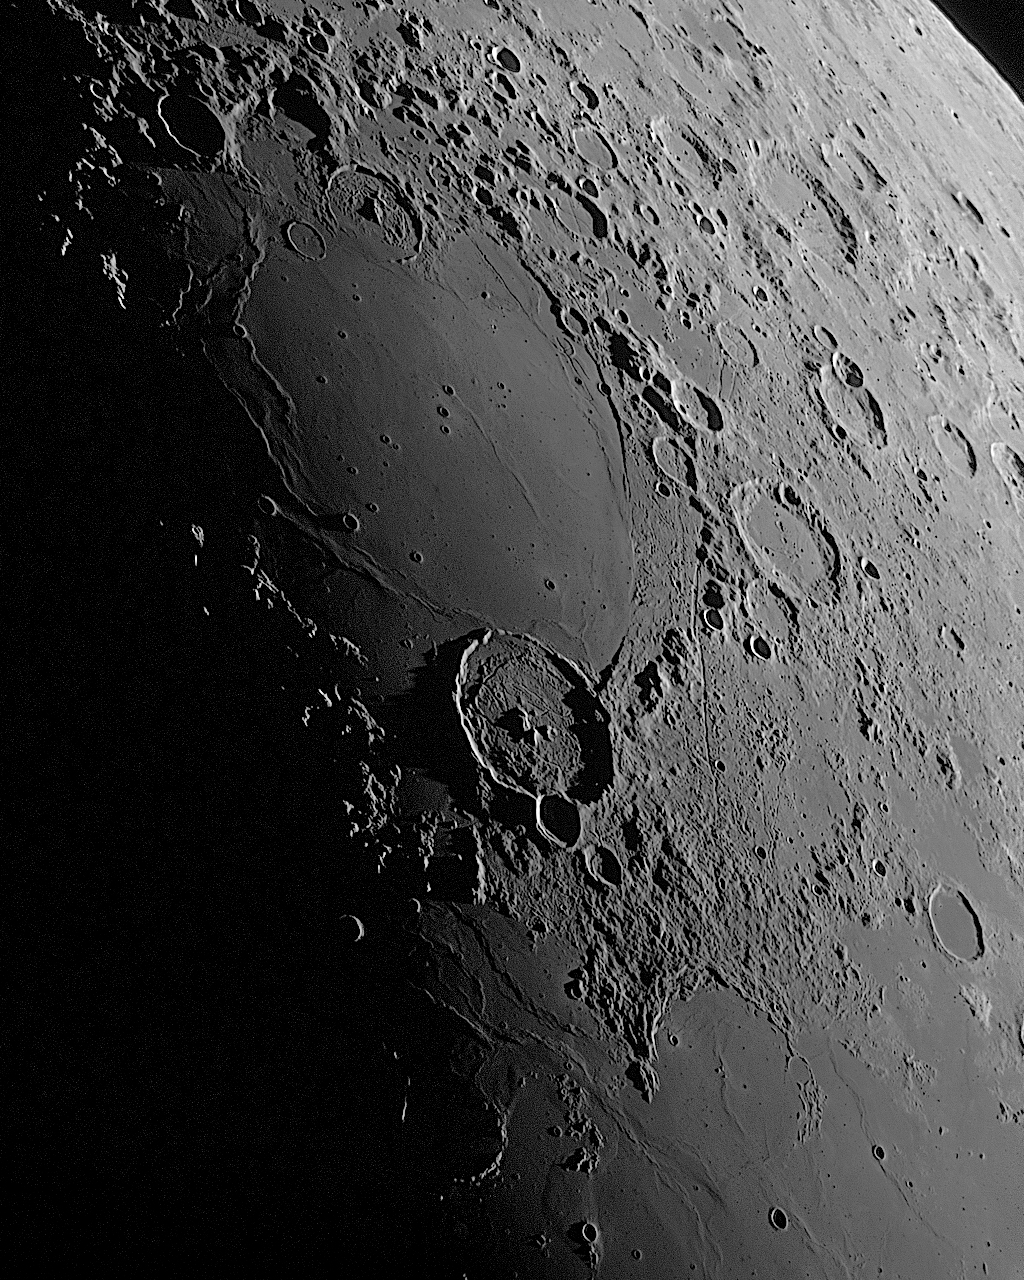 Moon_160730_051606_g2_ap962ZA.jpg